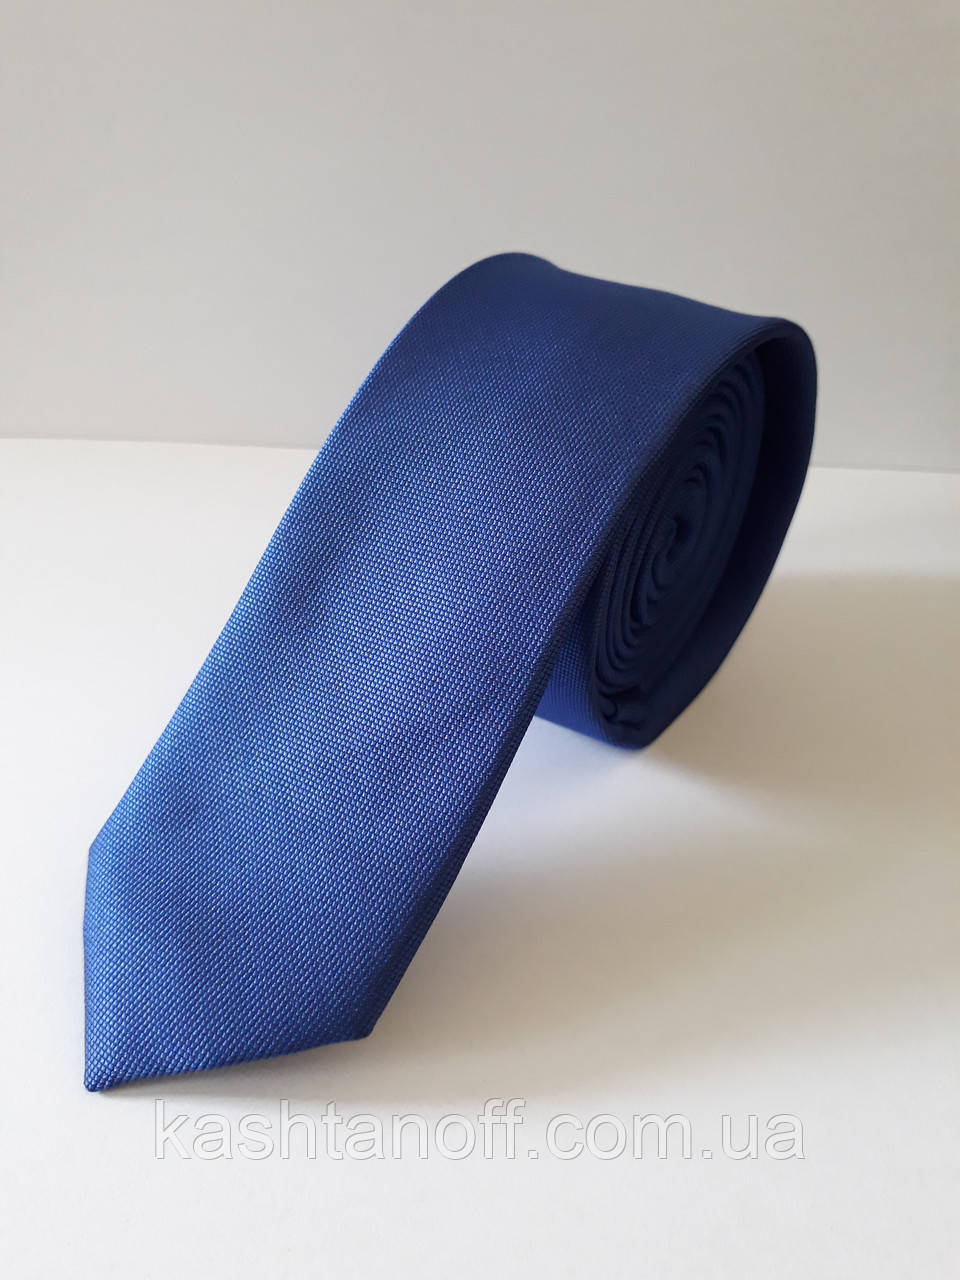 Узкий синий галстук